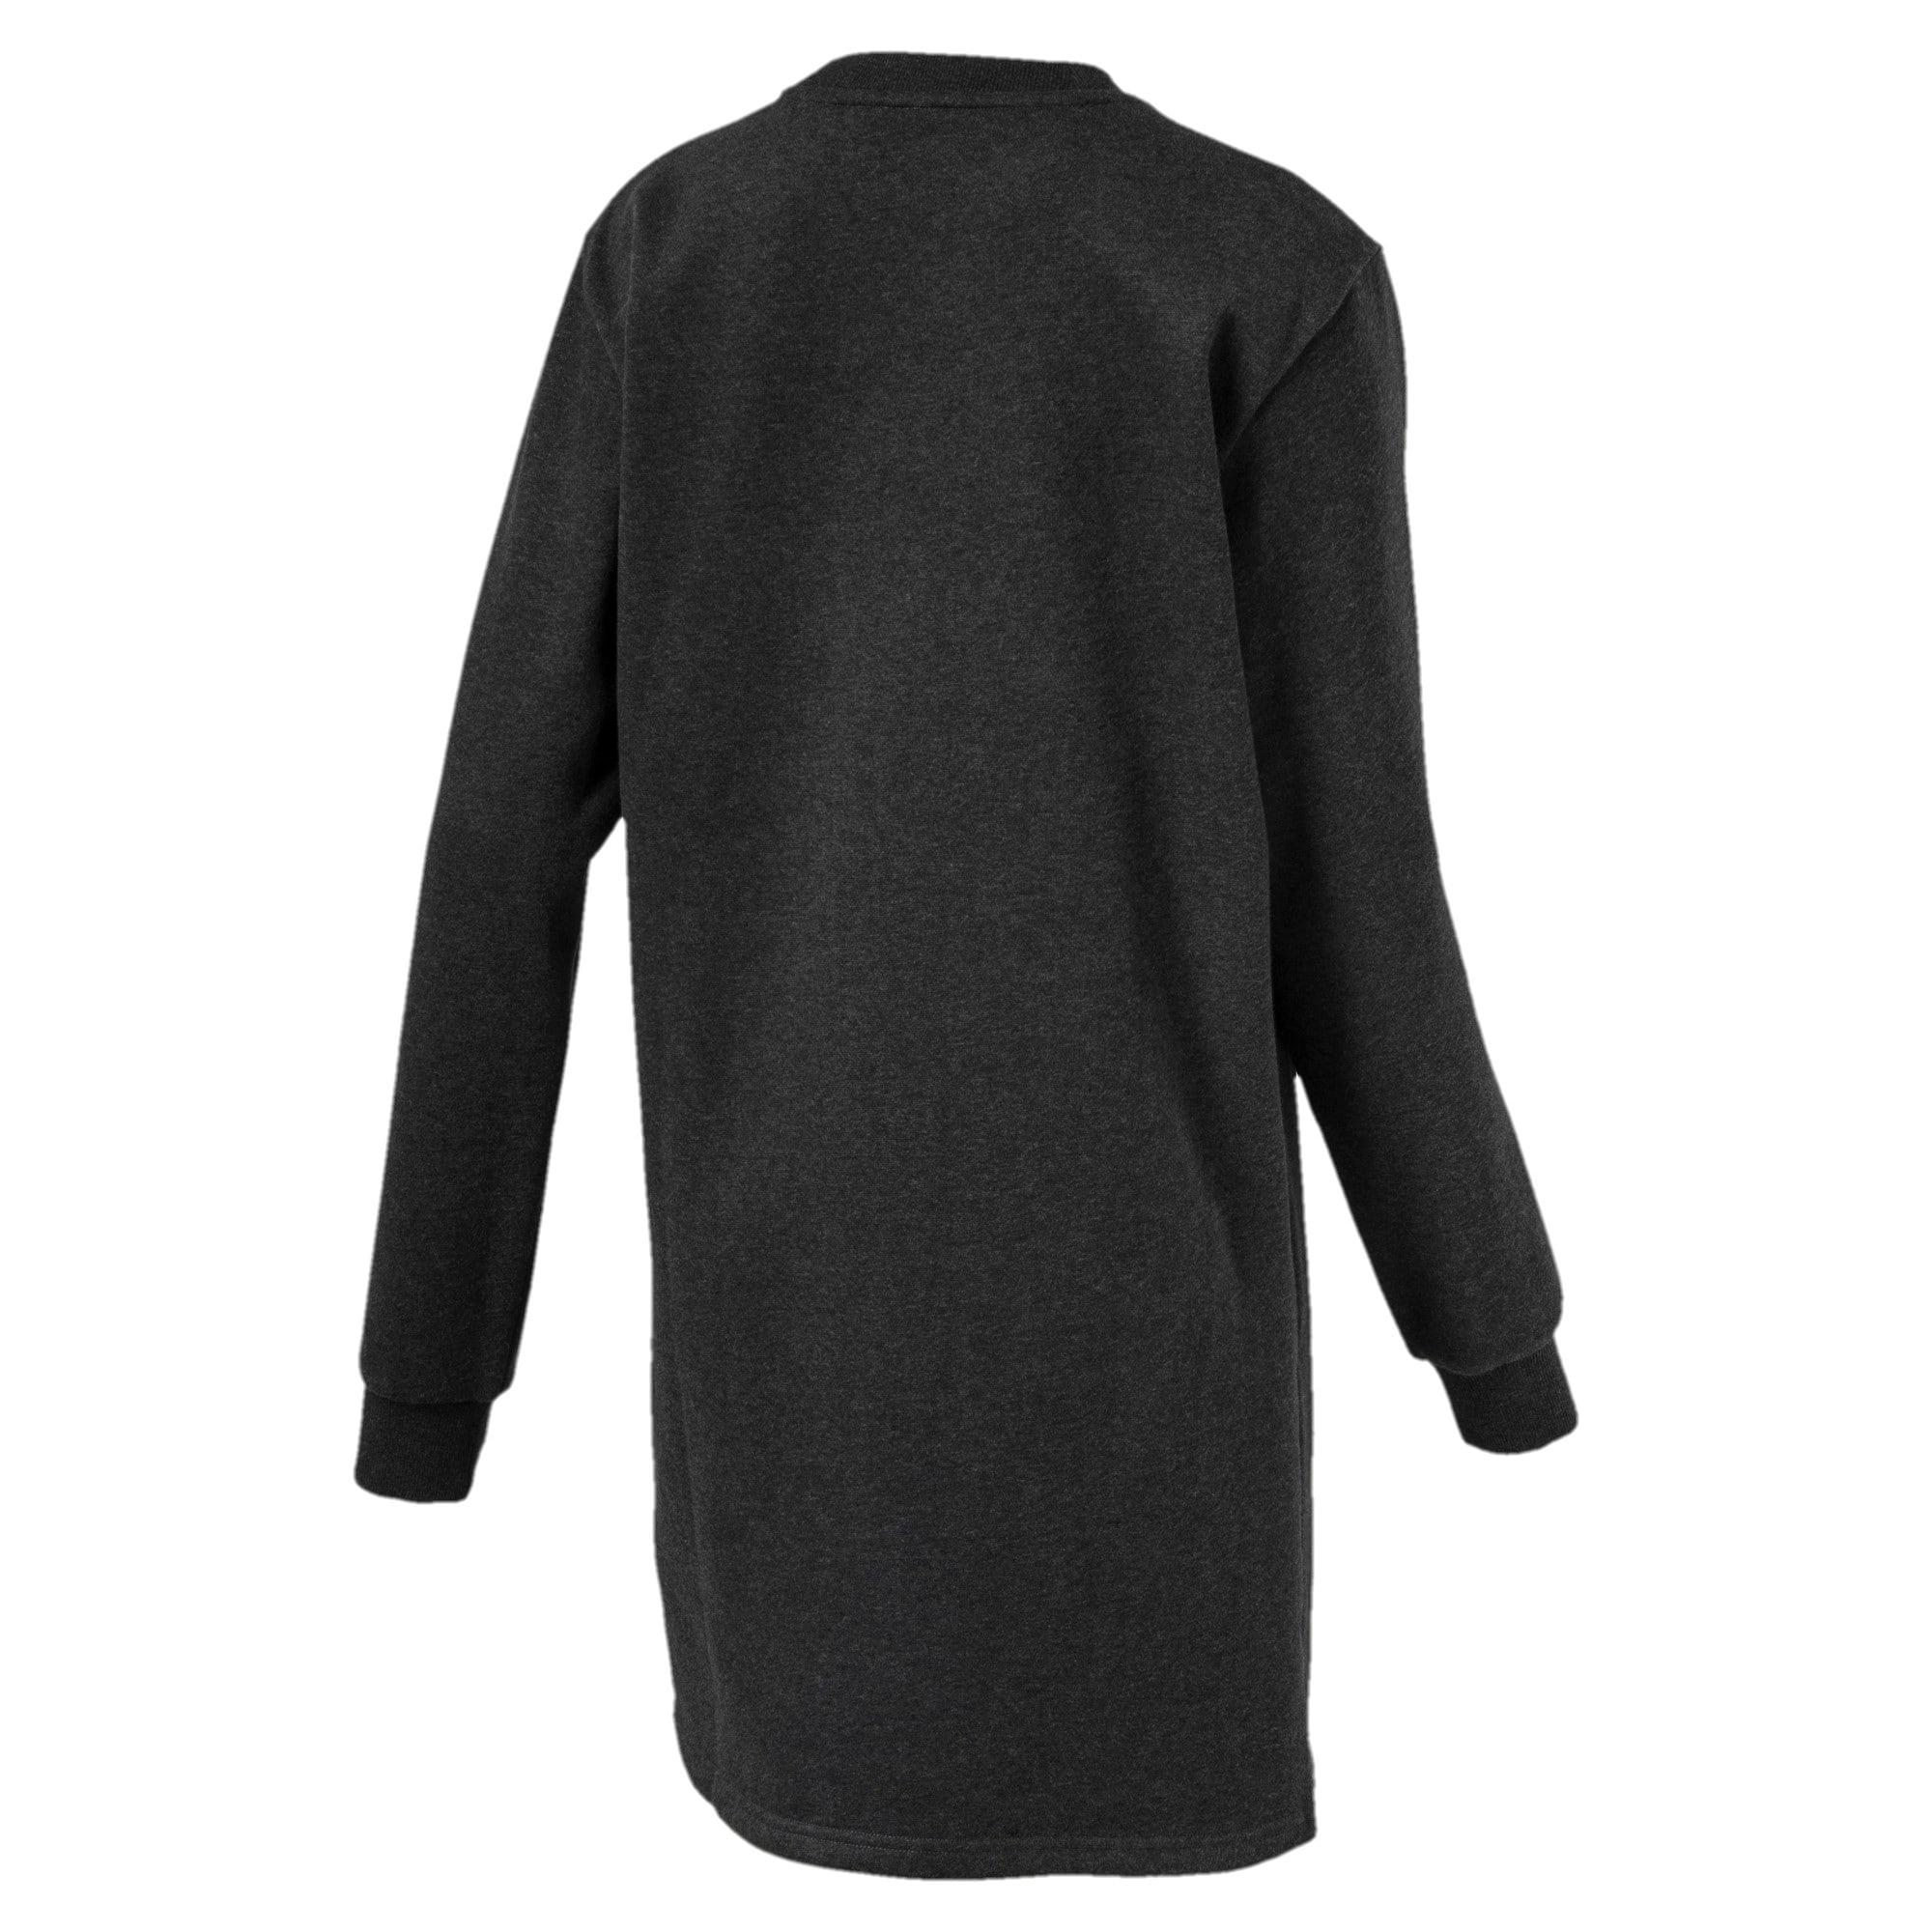 Thumbnail 3 of ATHLETIC Dress, DarkGrayHeather-BronzeMedal, medium